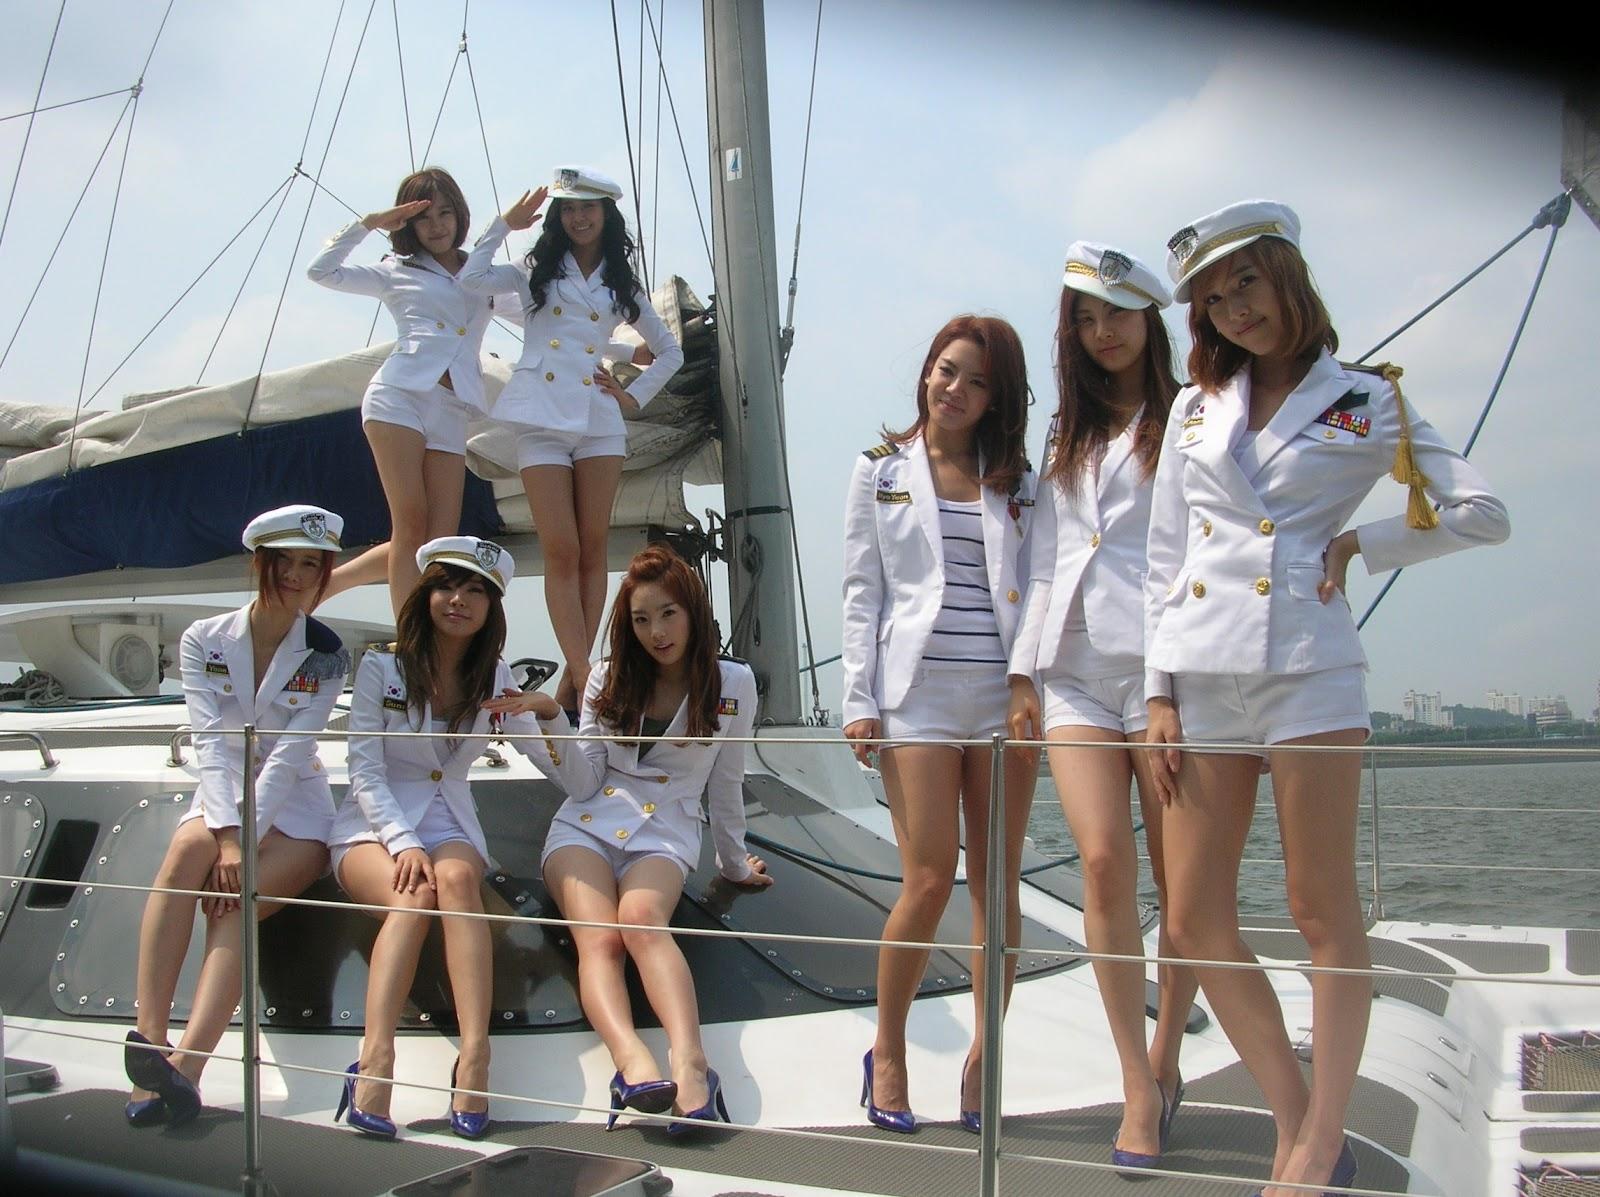 SNSD Sexy Sailor Girls Wallpaper | SNSD Artistic Gallery